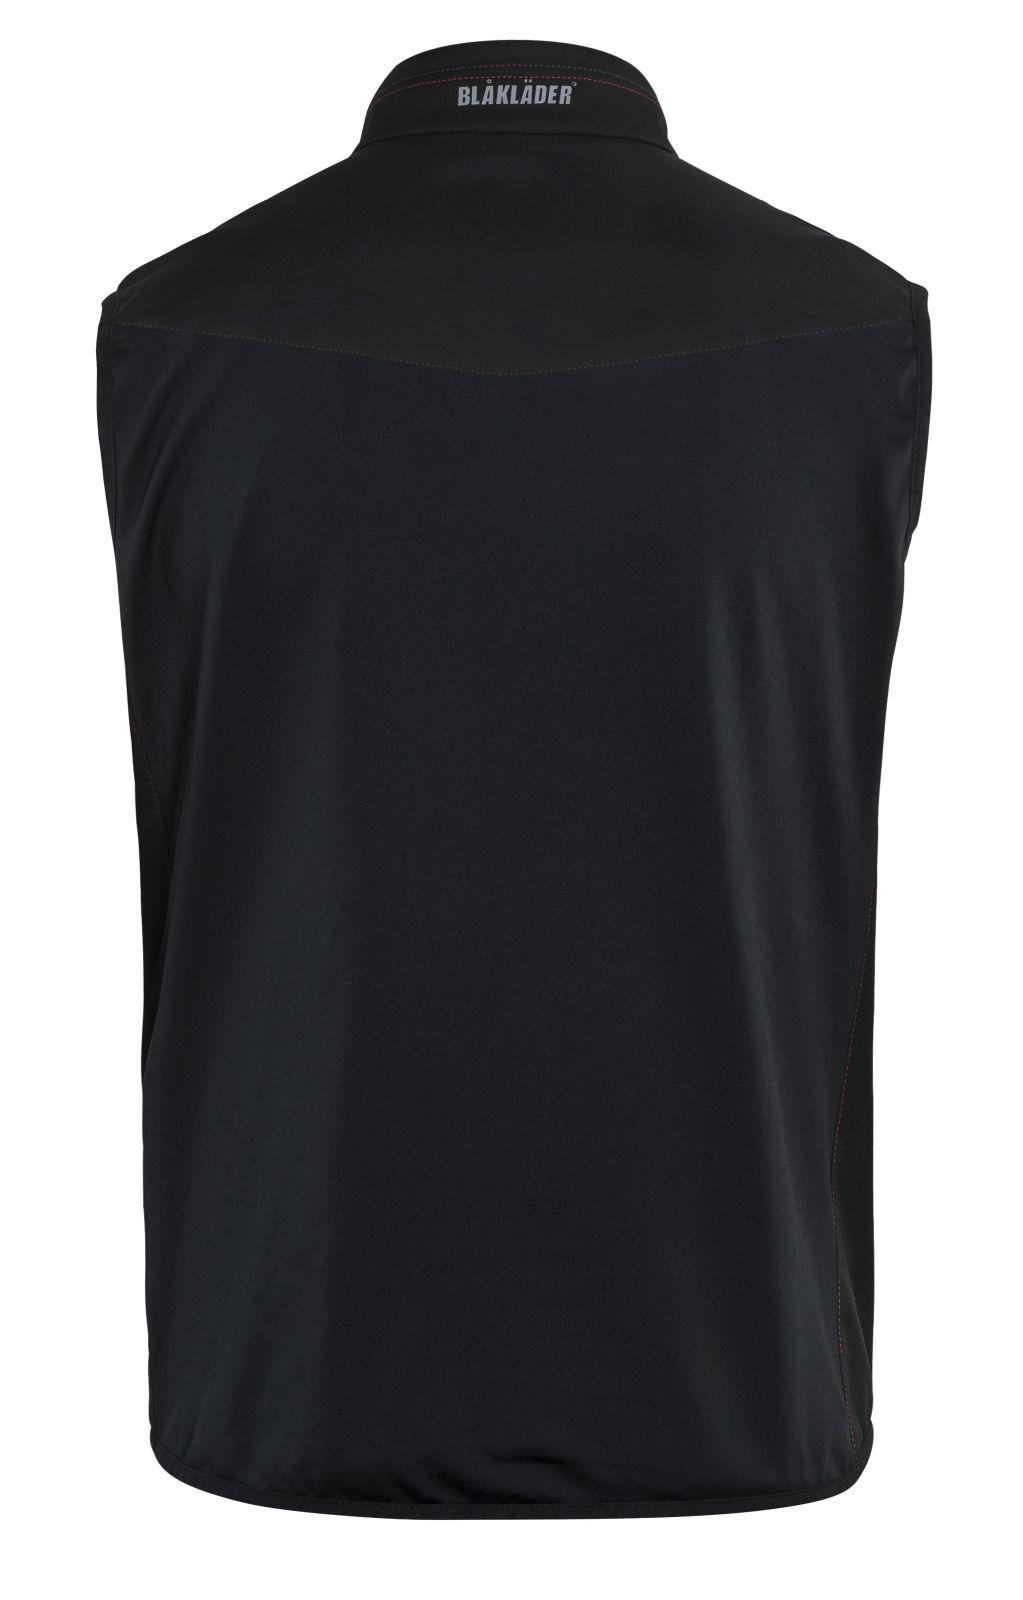 Blaklader Softshell bodywarmers 38502516 zwart-rood(9956)